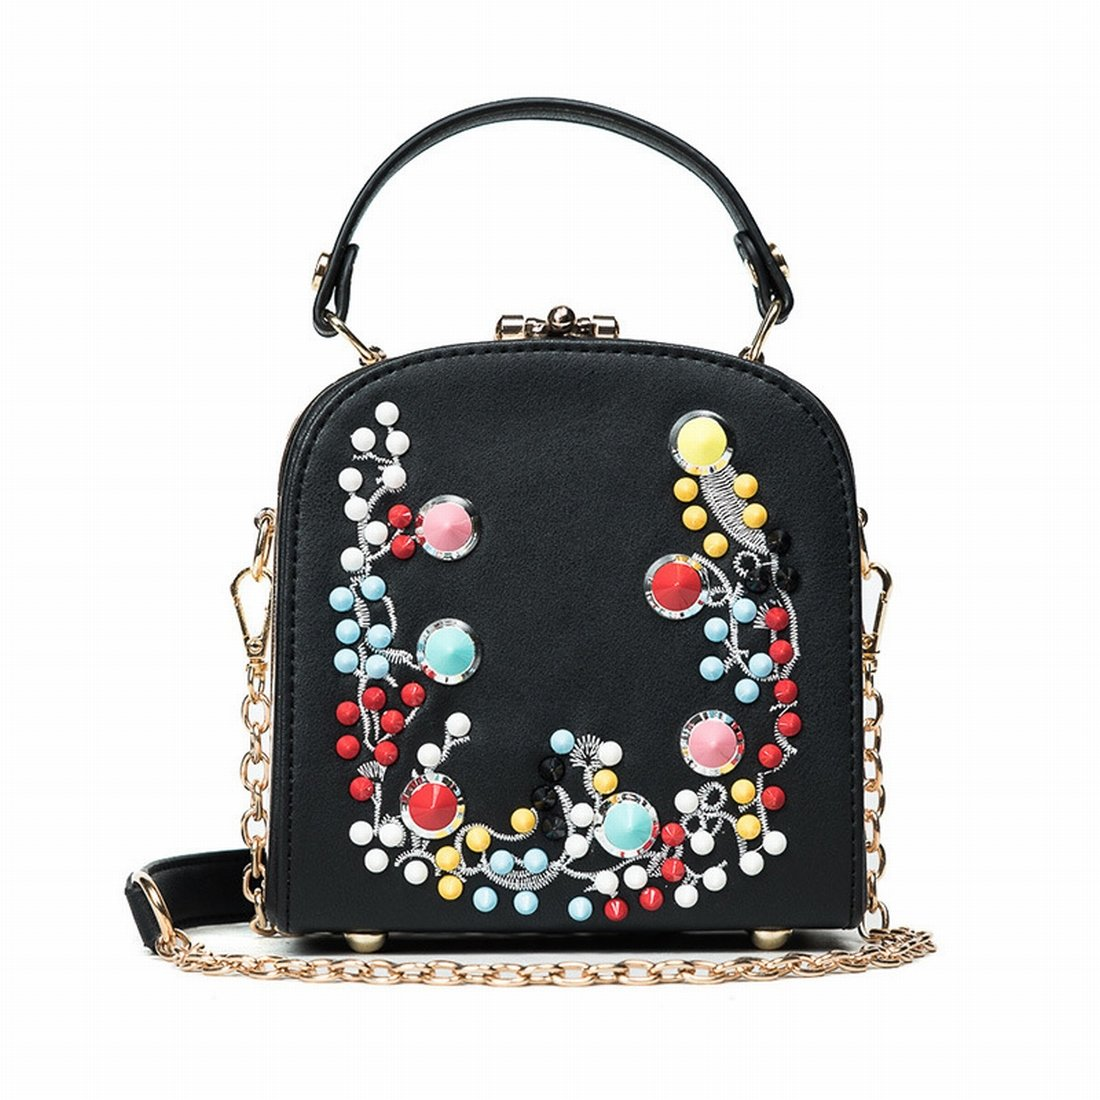 Fashion Bag Hit Farbe Liu Nail Handtasche Schultertasche Freizeit Kette Messenger Bag